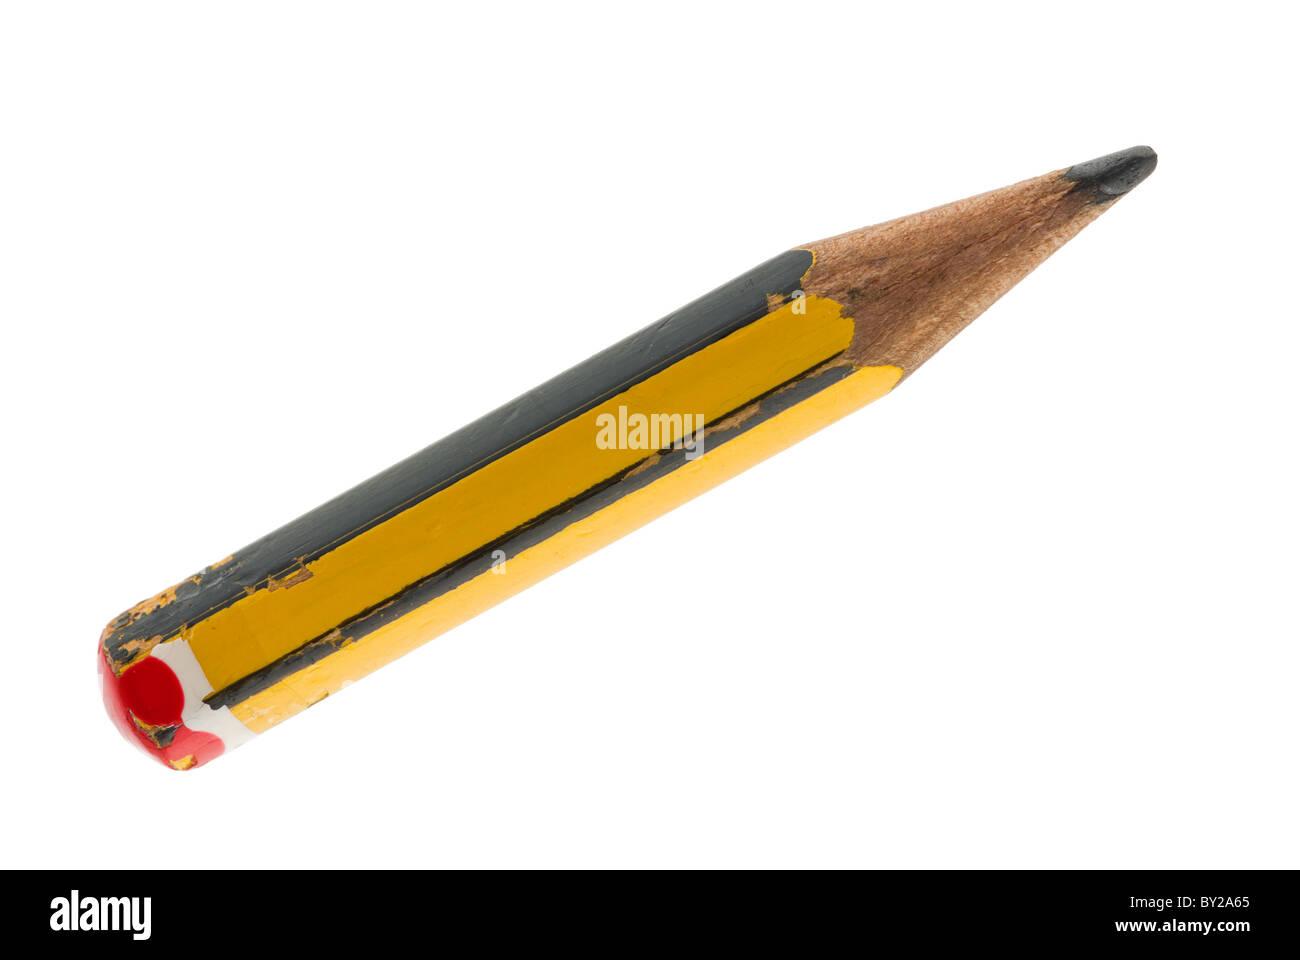 Kleine Bleistift - 2011 Stockbild